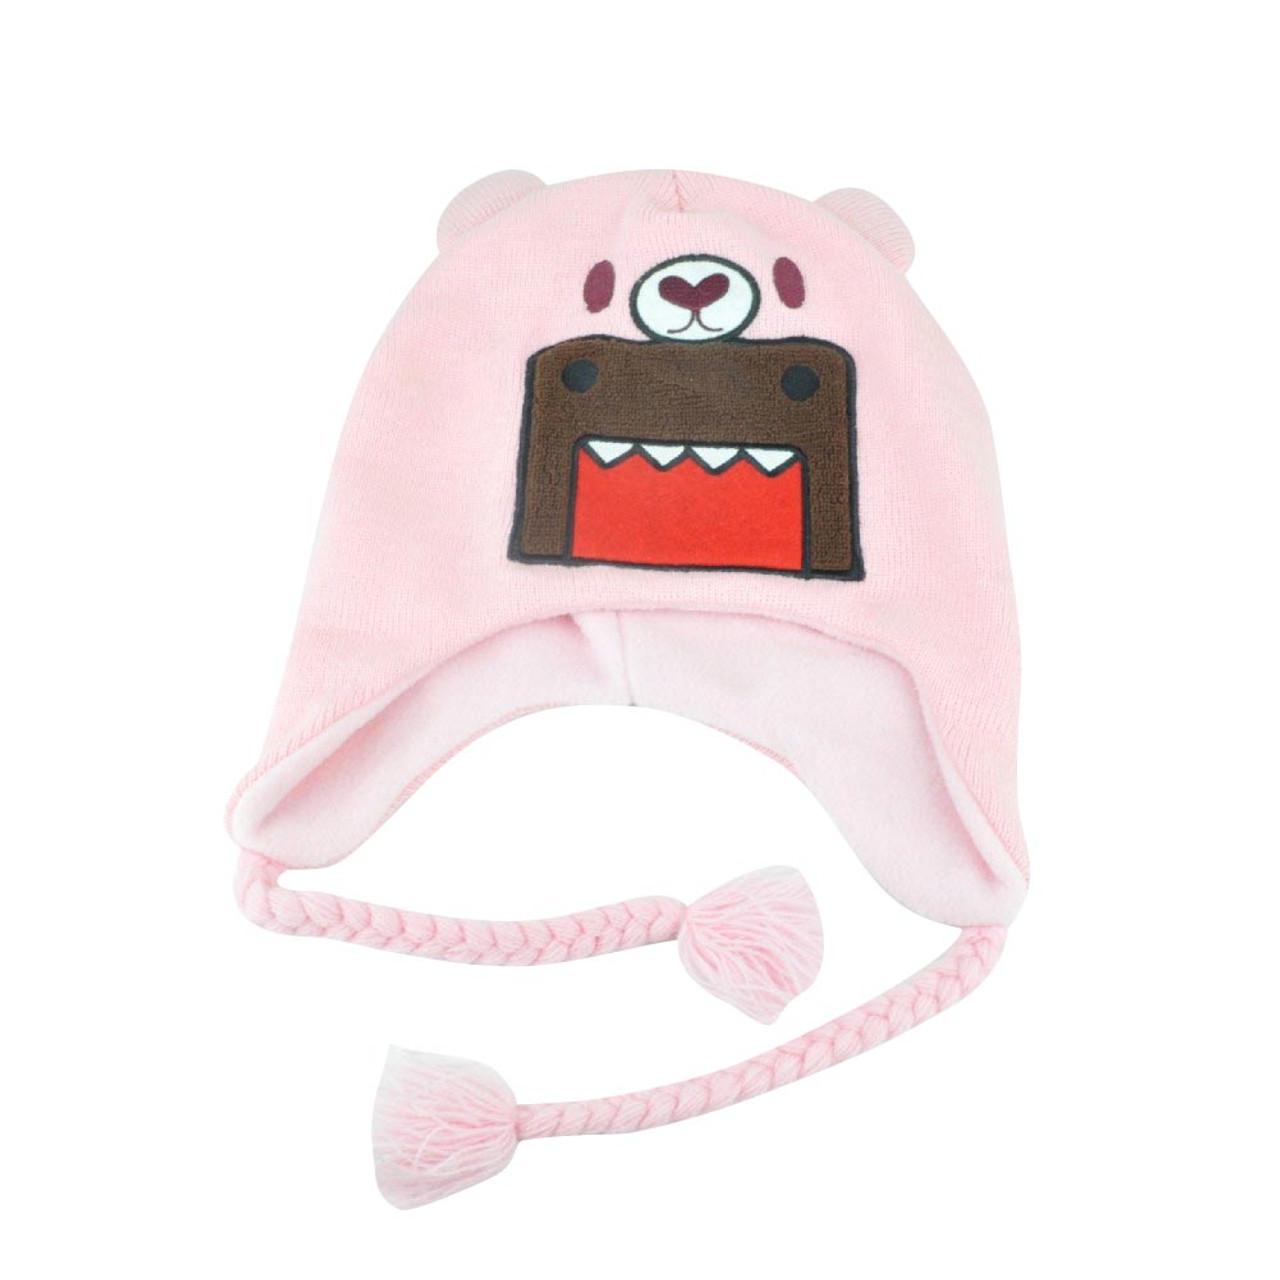 f7f4becb7bc Domo Kun Pink Bear Japanese Character Women Ladies Peruvian Knit Beanie  Warm Hat - Cap Store Online.com